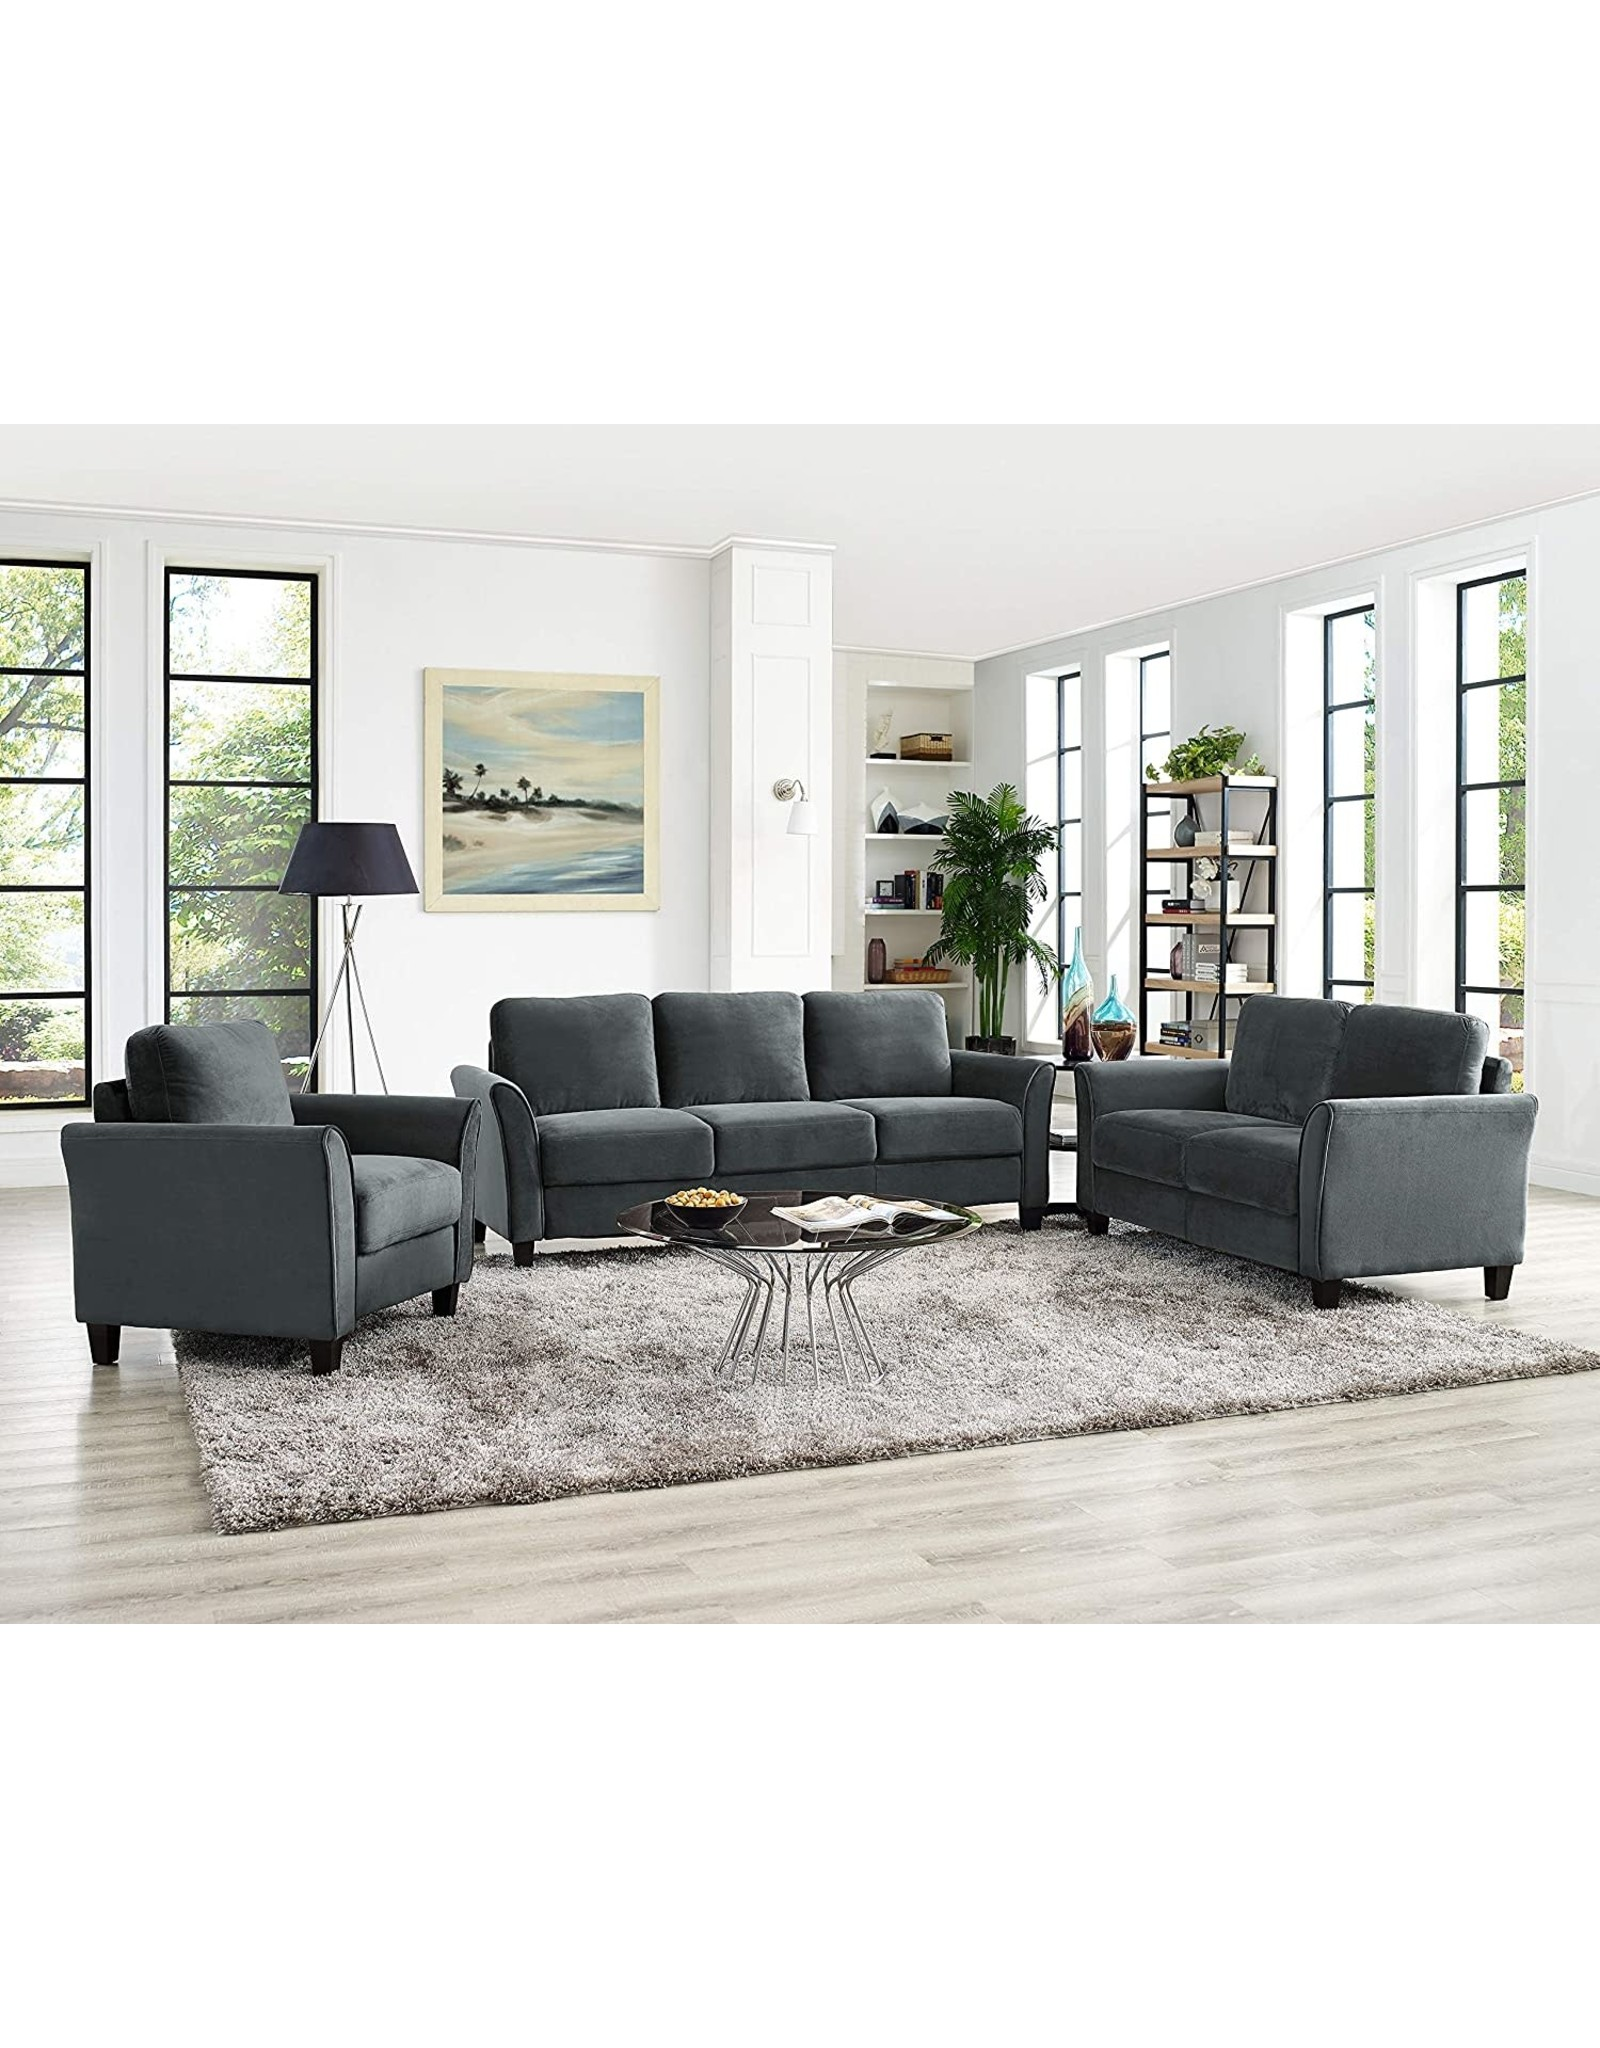 LifeStyle Solutions Lifestyle Solutions Wen Austin Curved-Arm Sofa Dark Grey